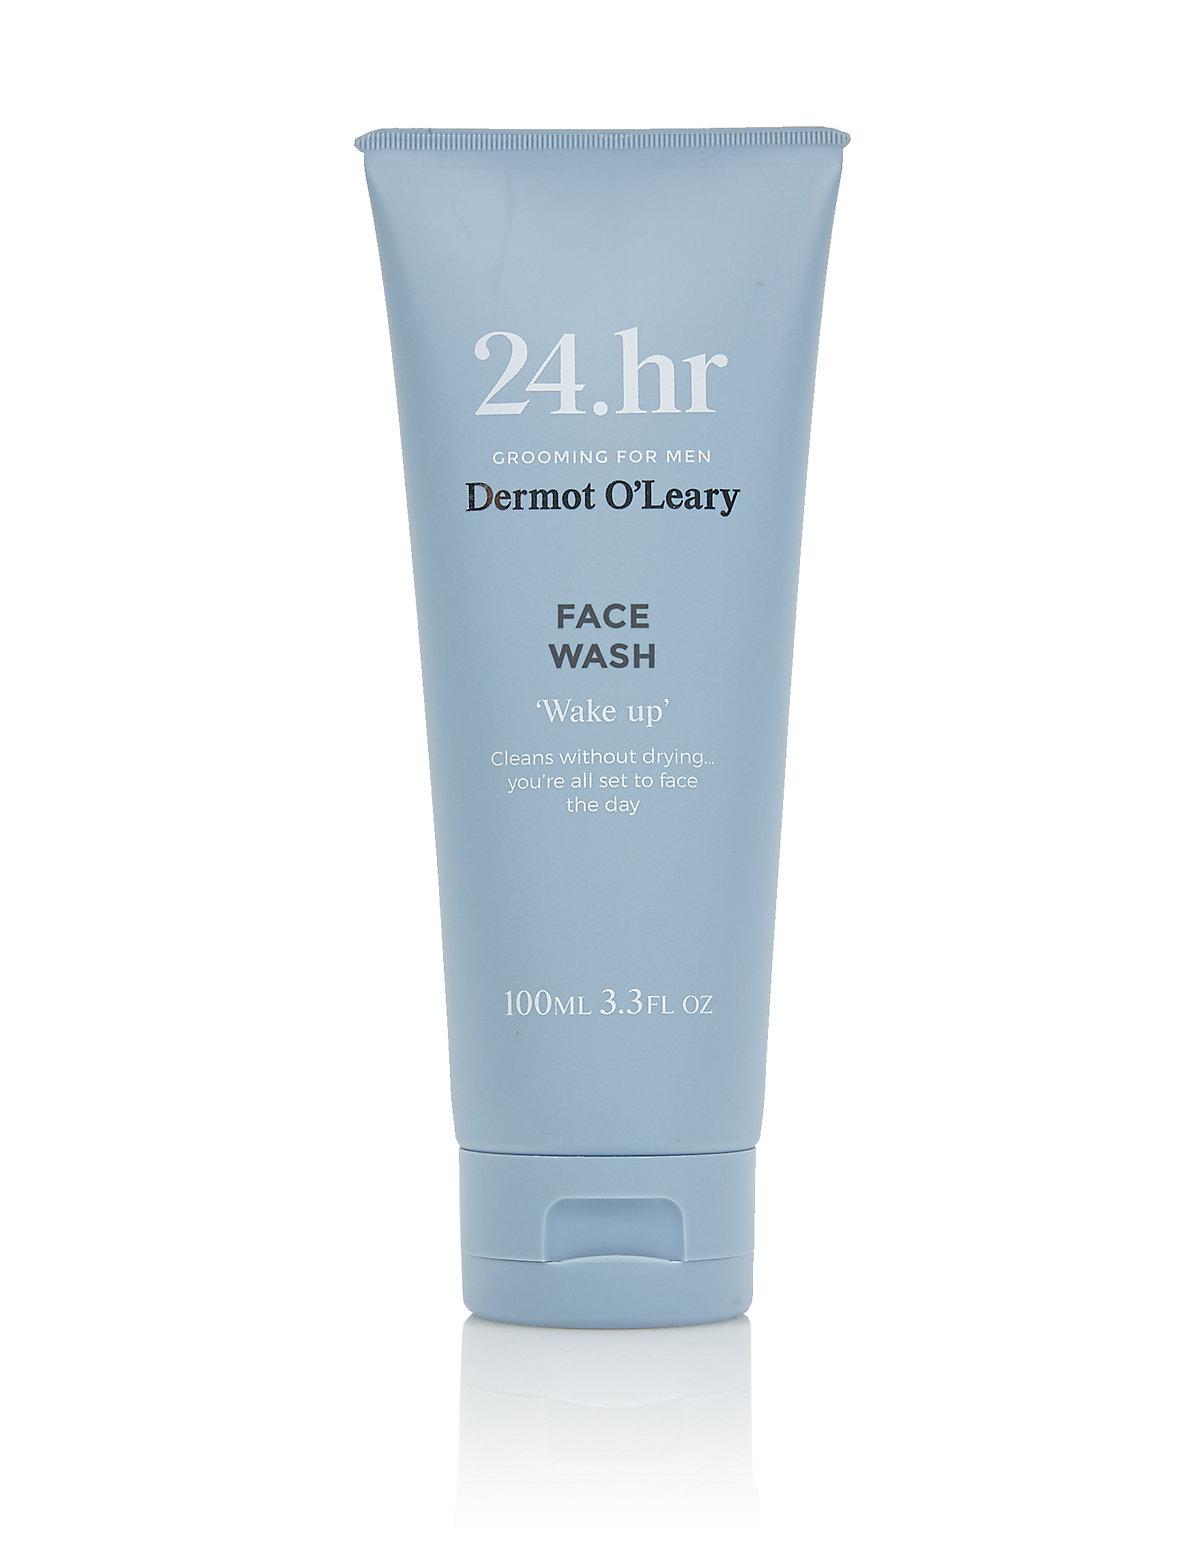 Dermot O'Leary Face Wash 100ml